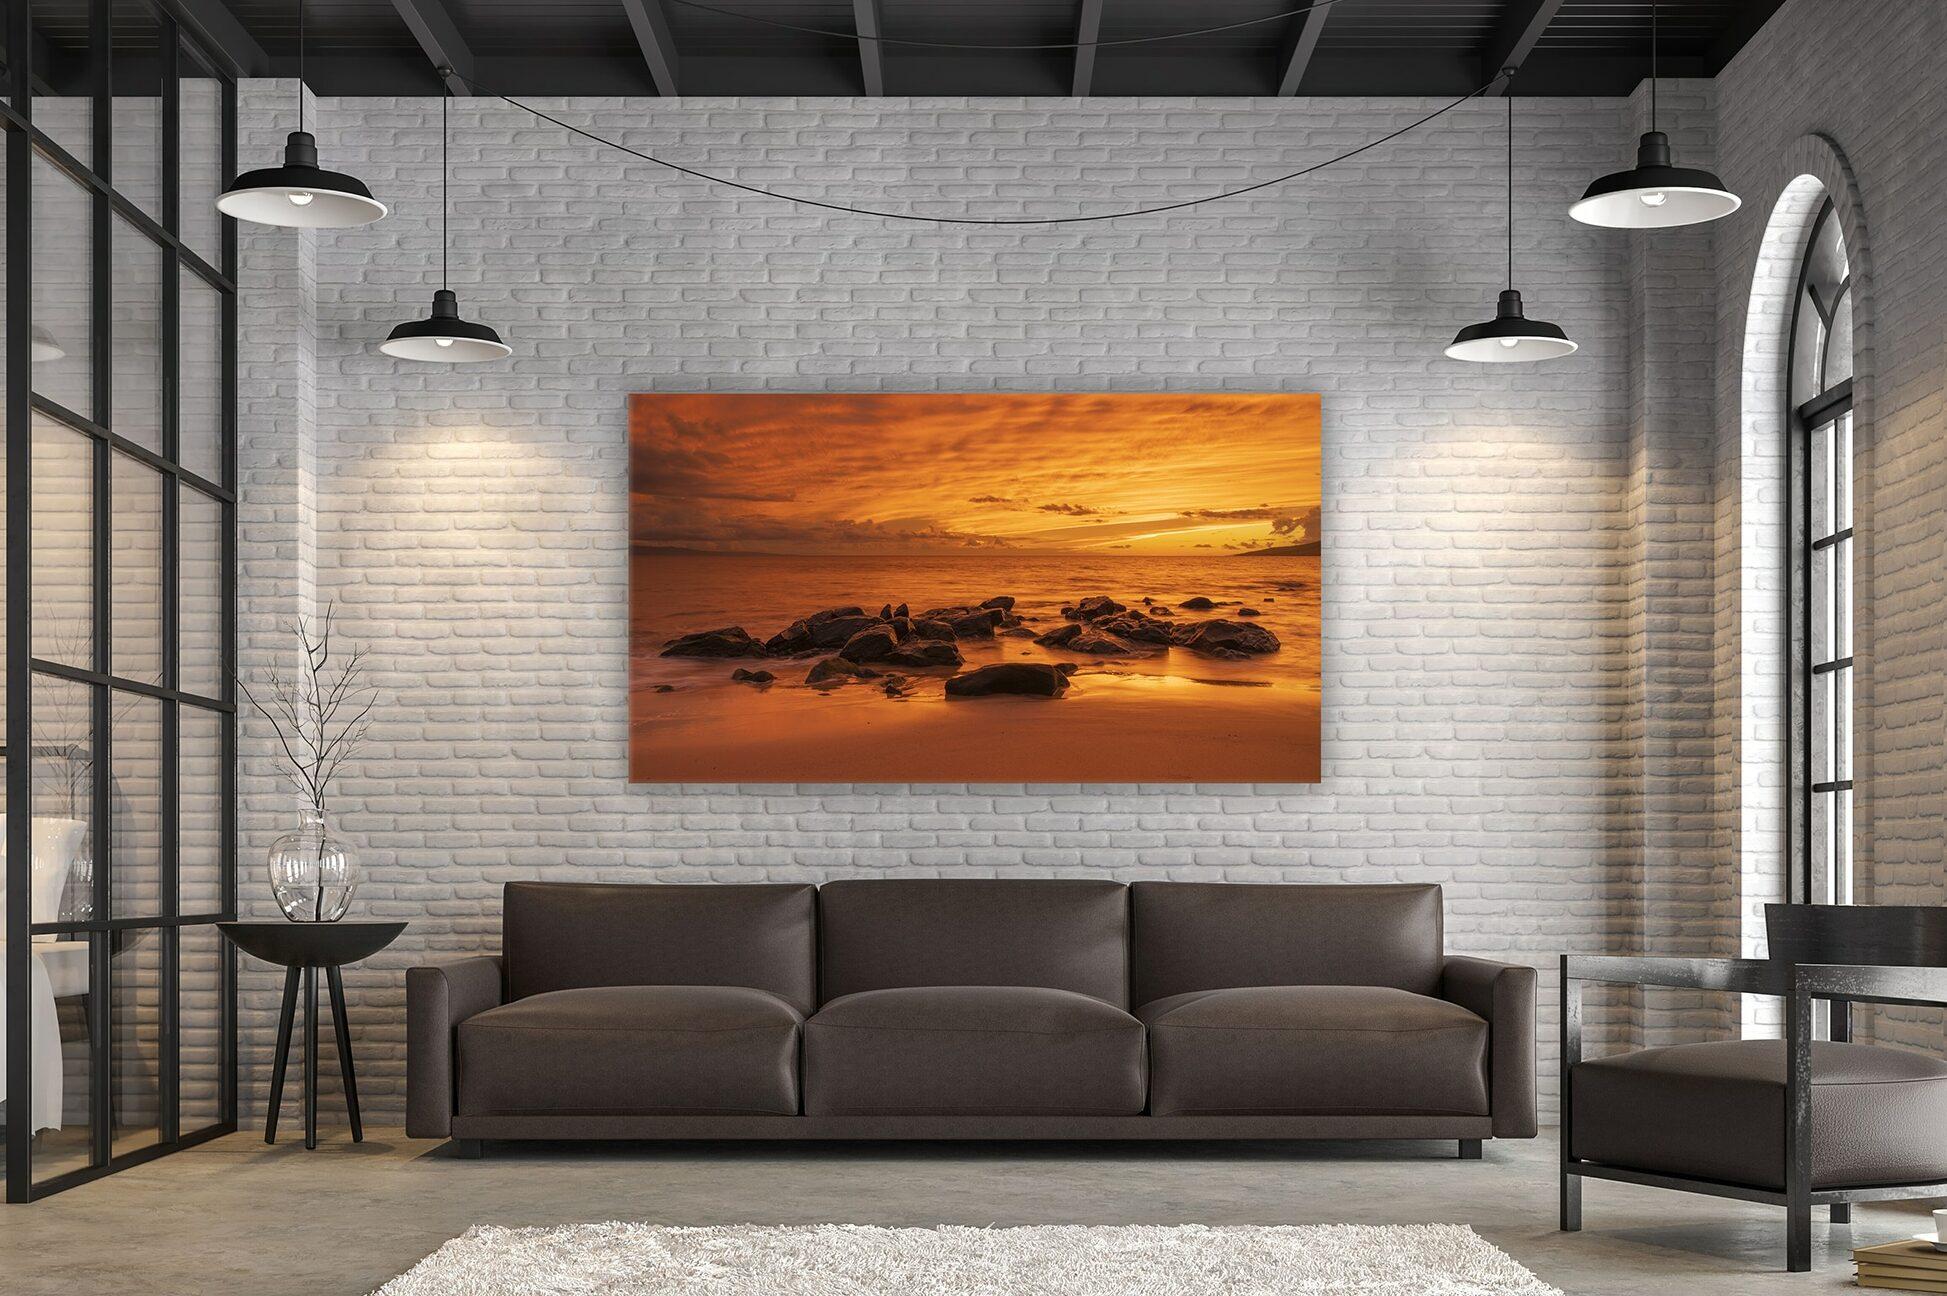 Maui Photography Fine Art, Shop Maui Landscape Photograhy at Douglas J Hoffman's Gallery Store.